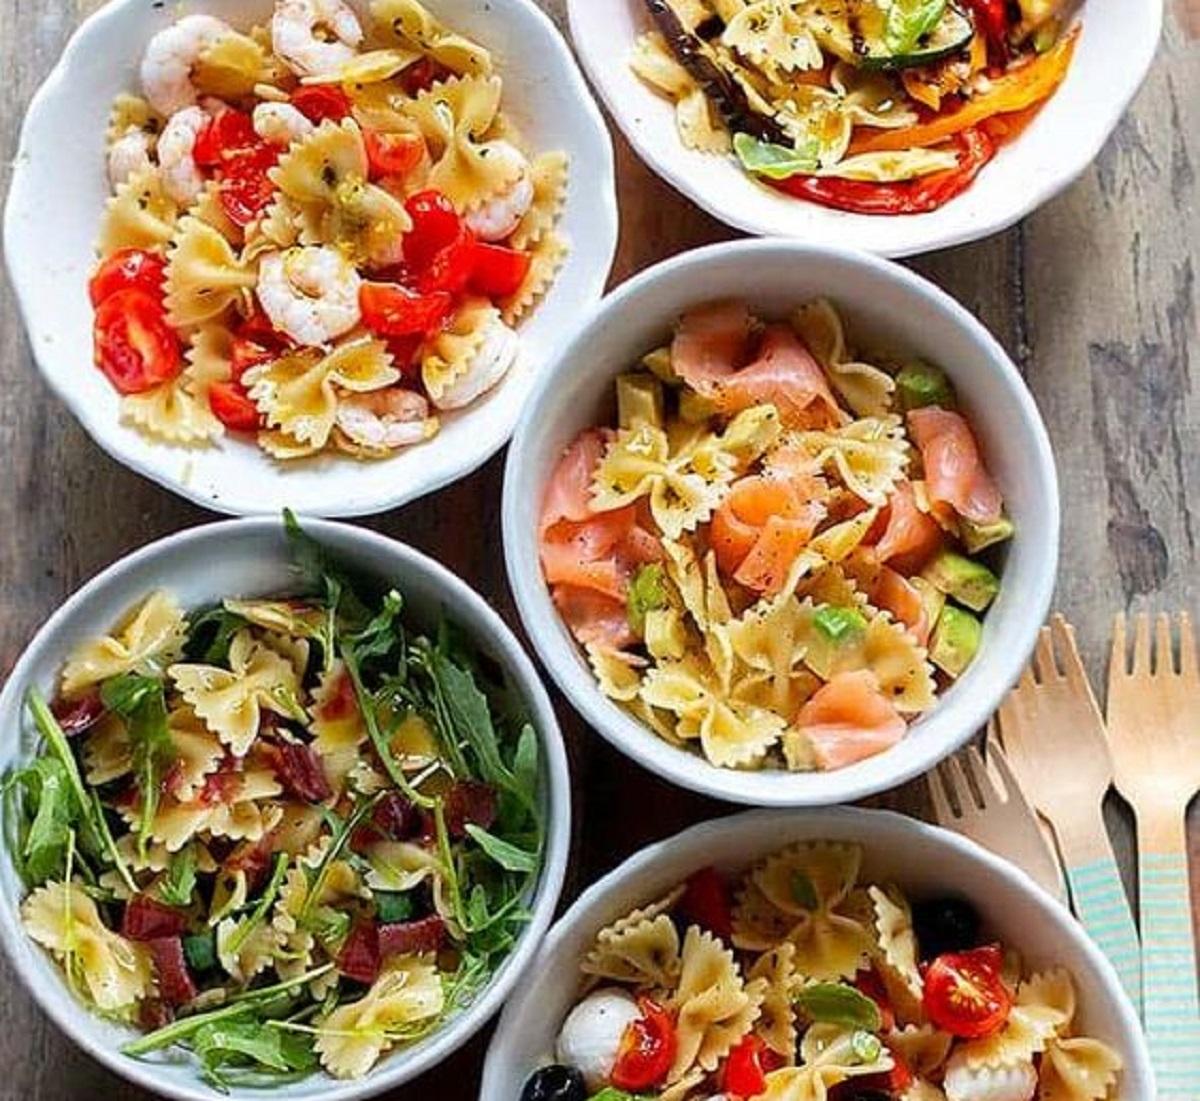 ricette pasta fredda estiva light: 5 proposte